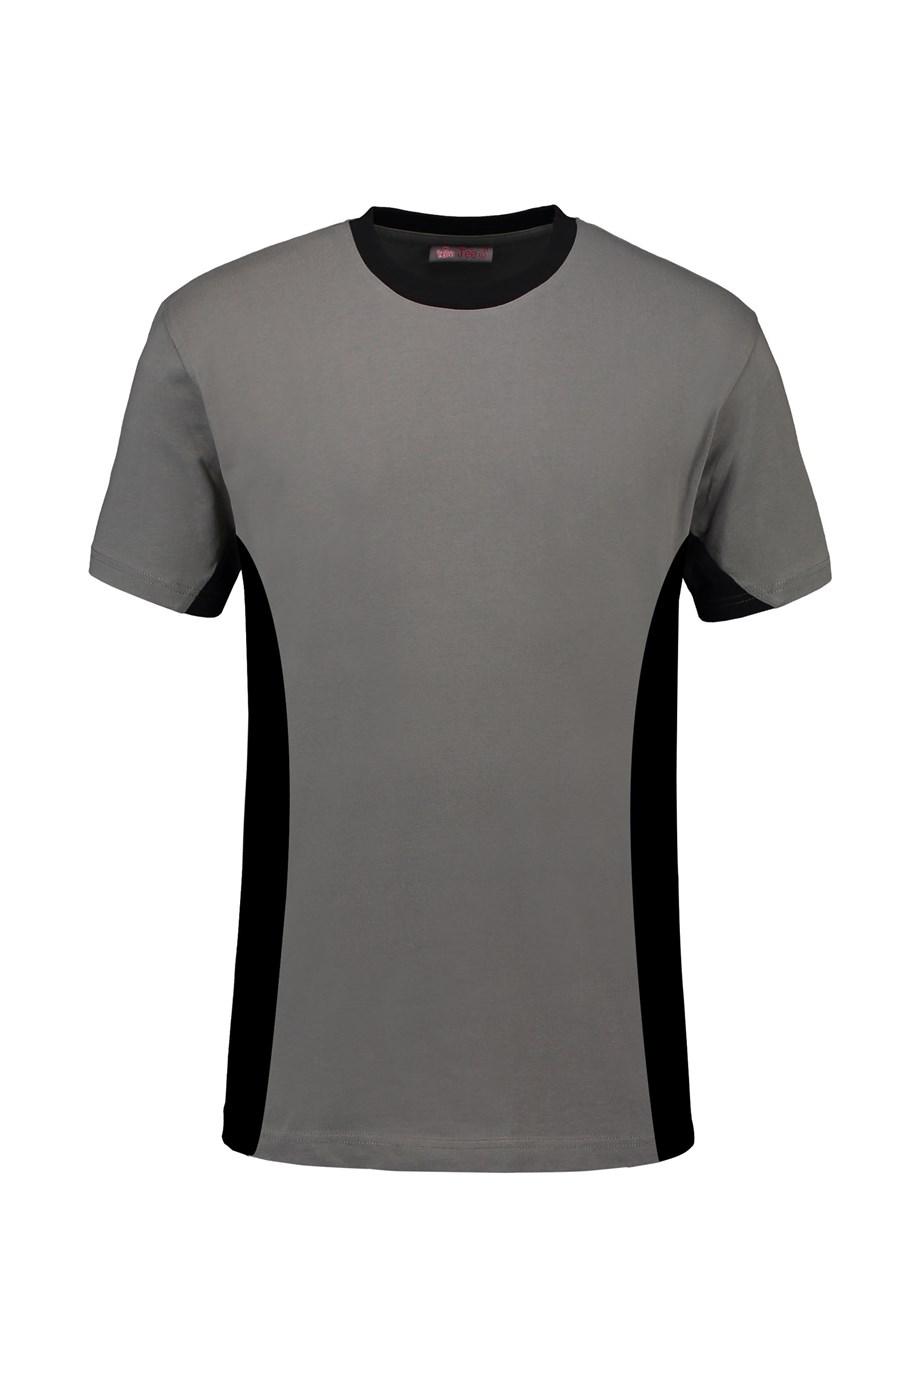 pearl grey -  black